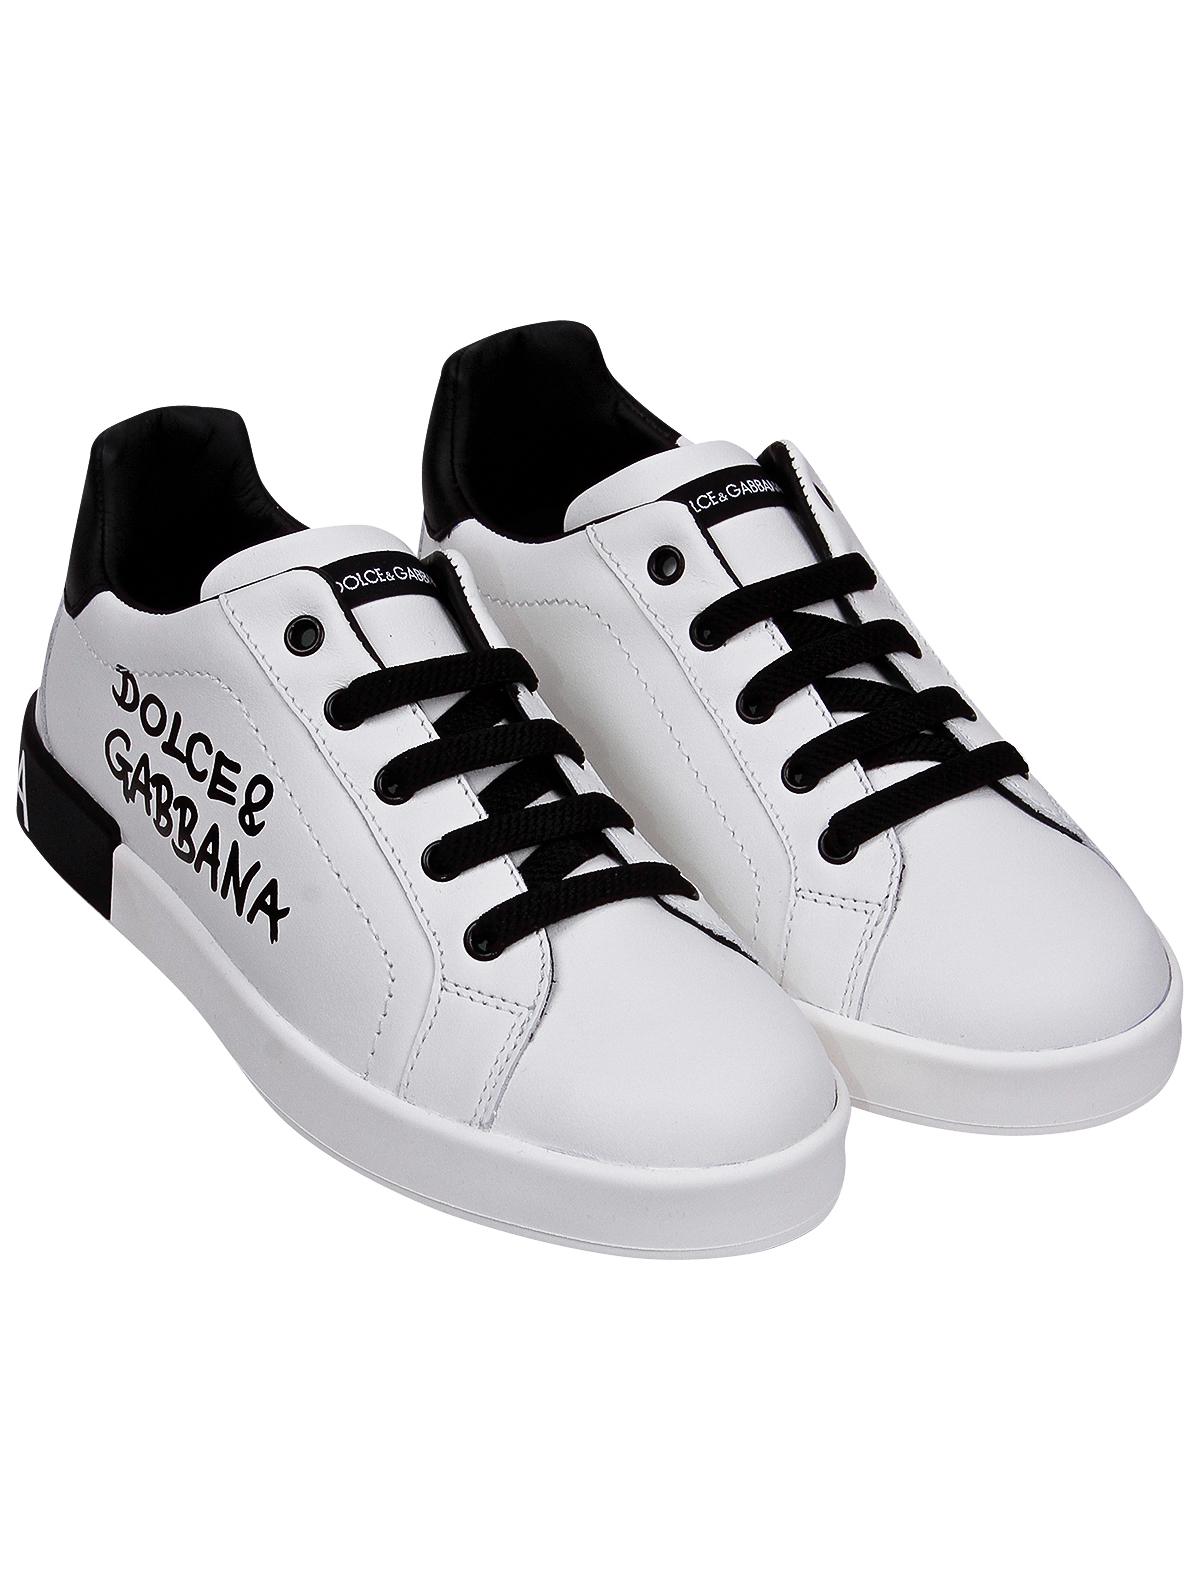 Купить 2281878, Кеды Dolce & Gabbana, белый, 2094529172025